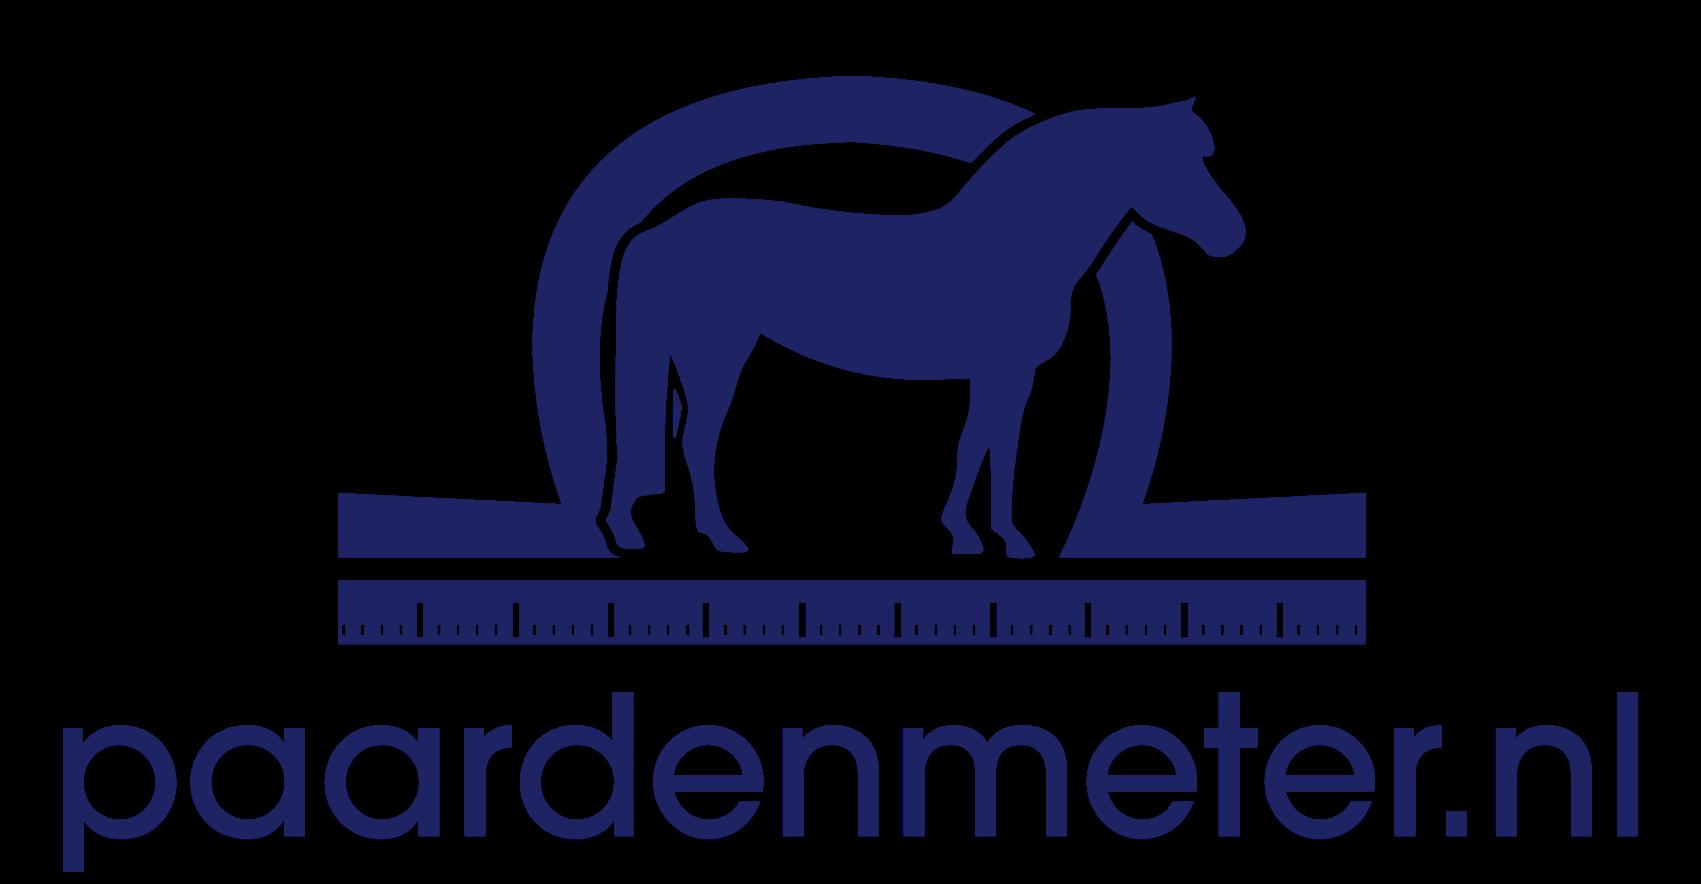 Paardenmeter.nl